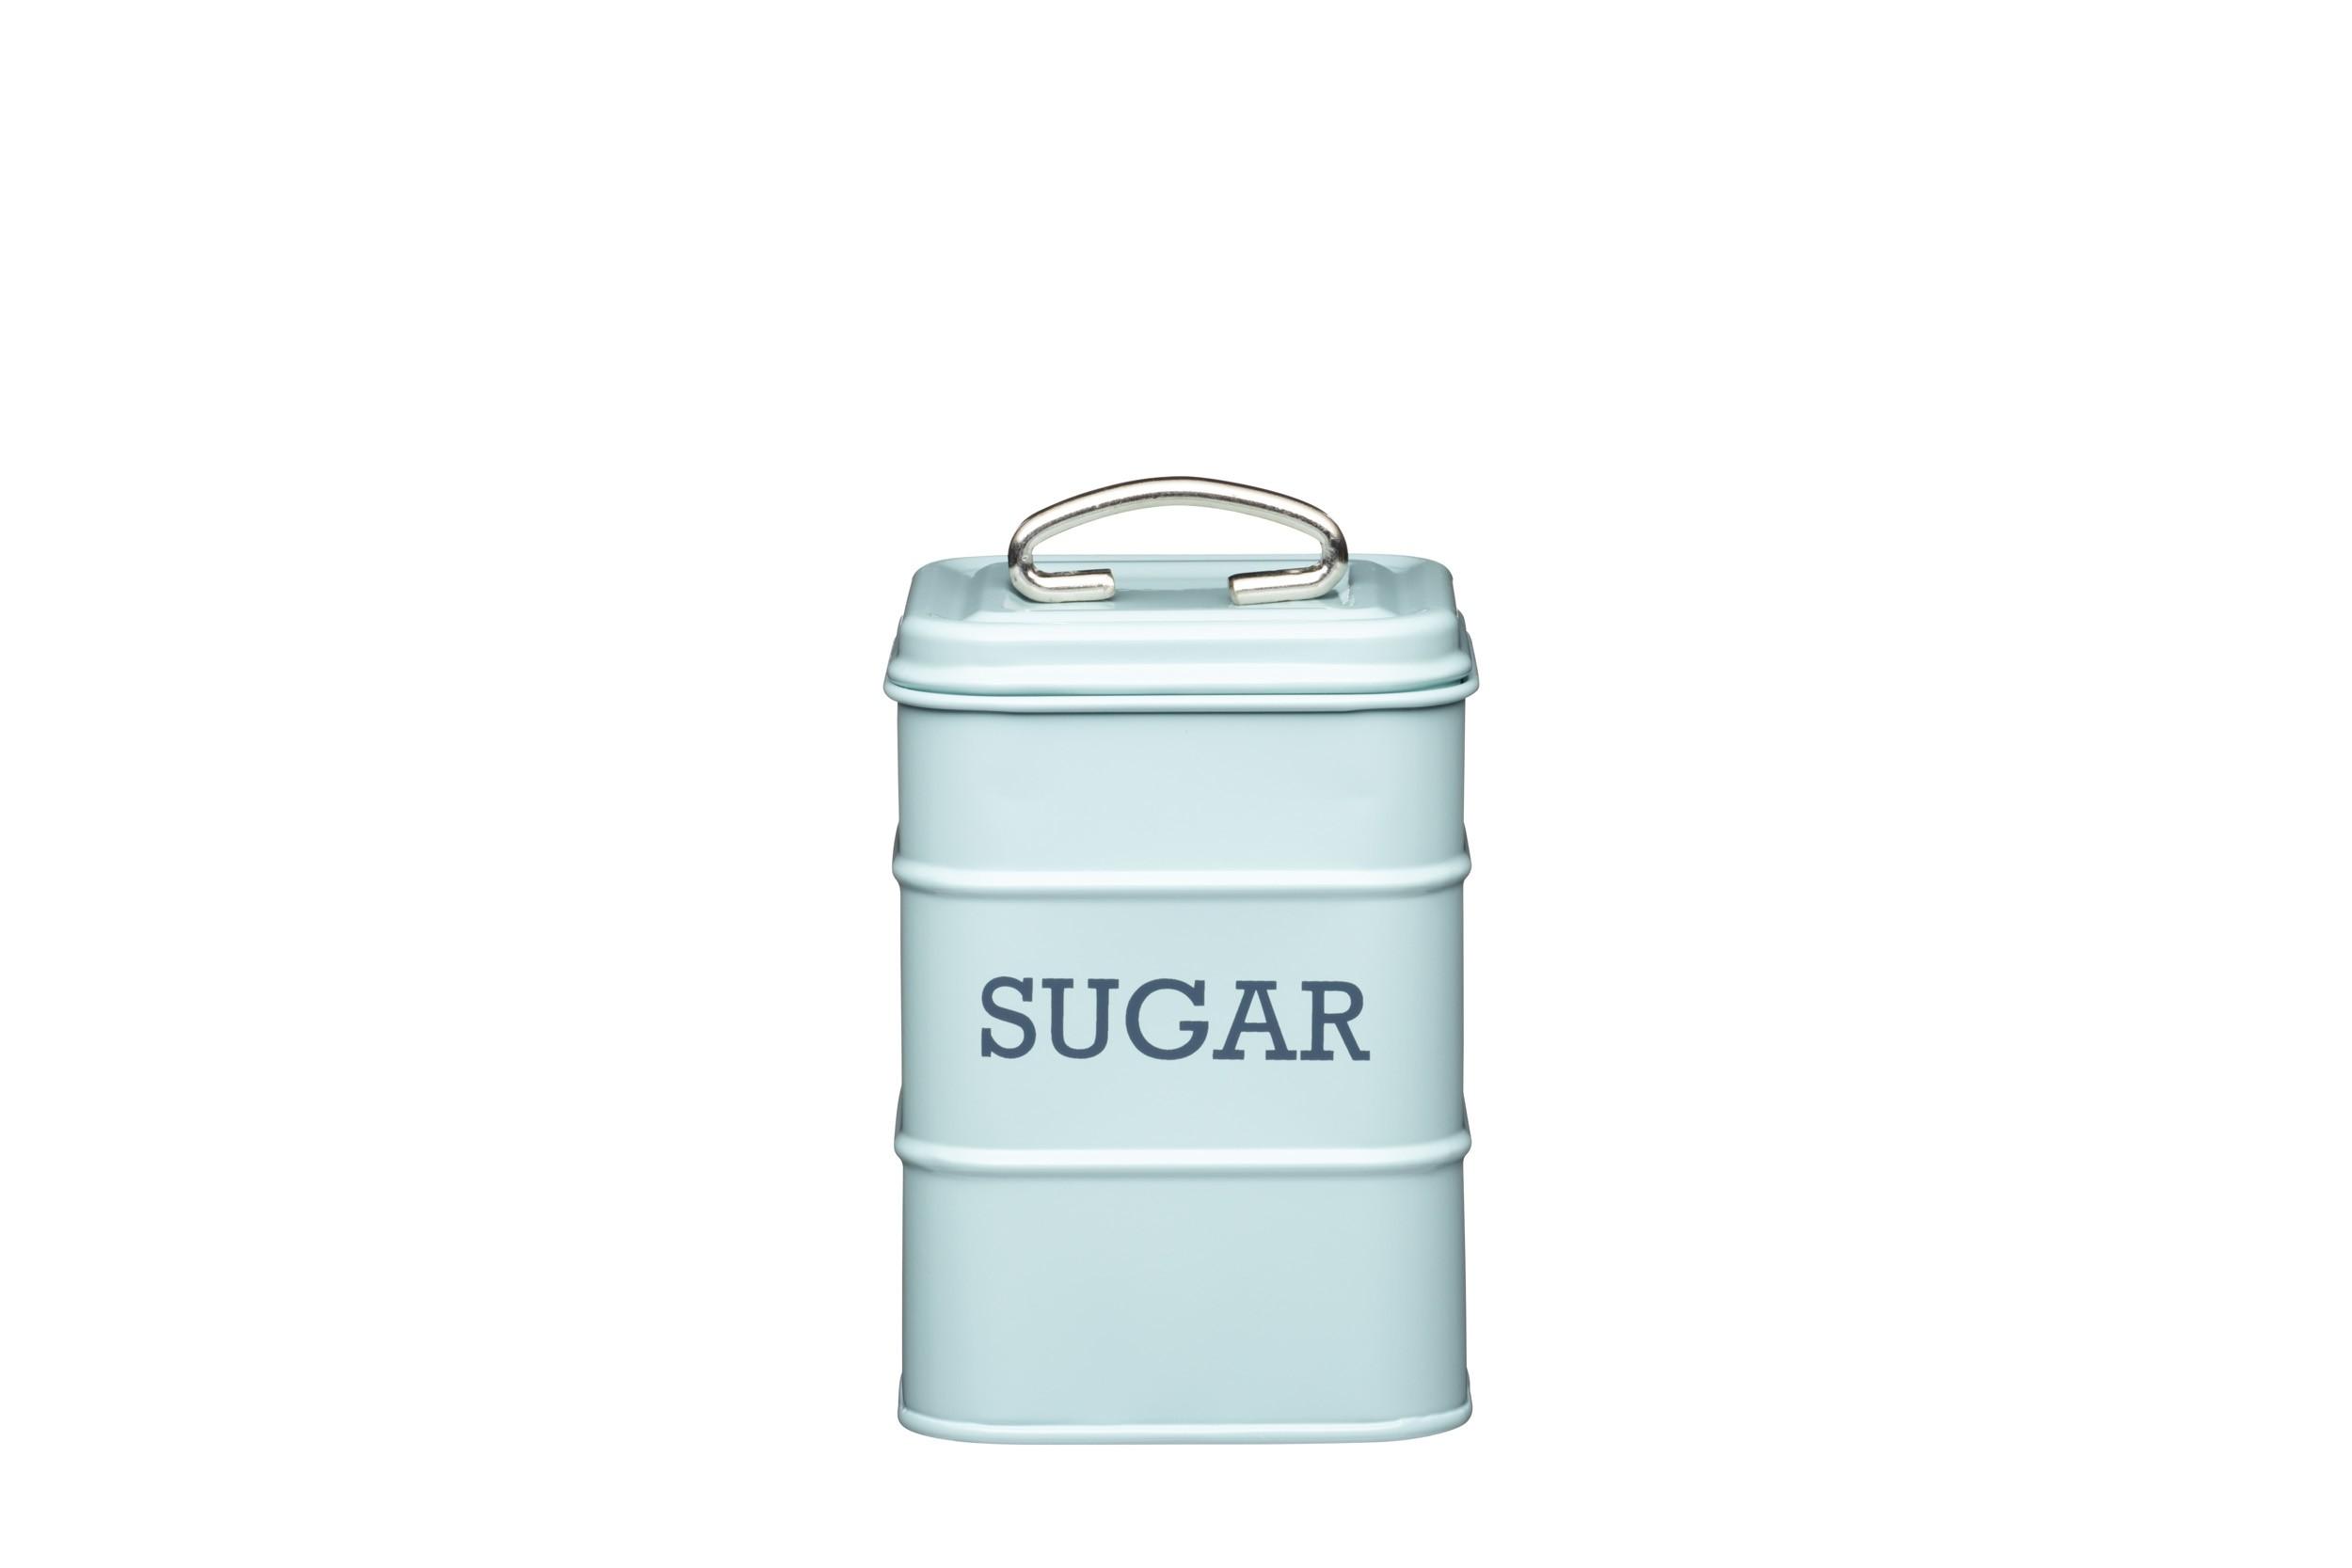 Kitchen Craft Living Nostalgia Sugar Canister Blue 11cm X 17cm